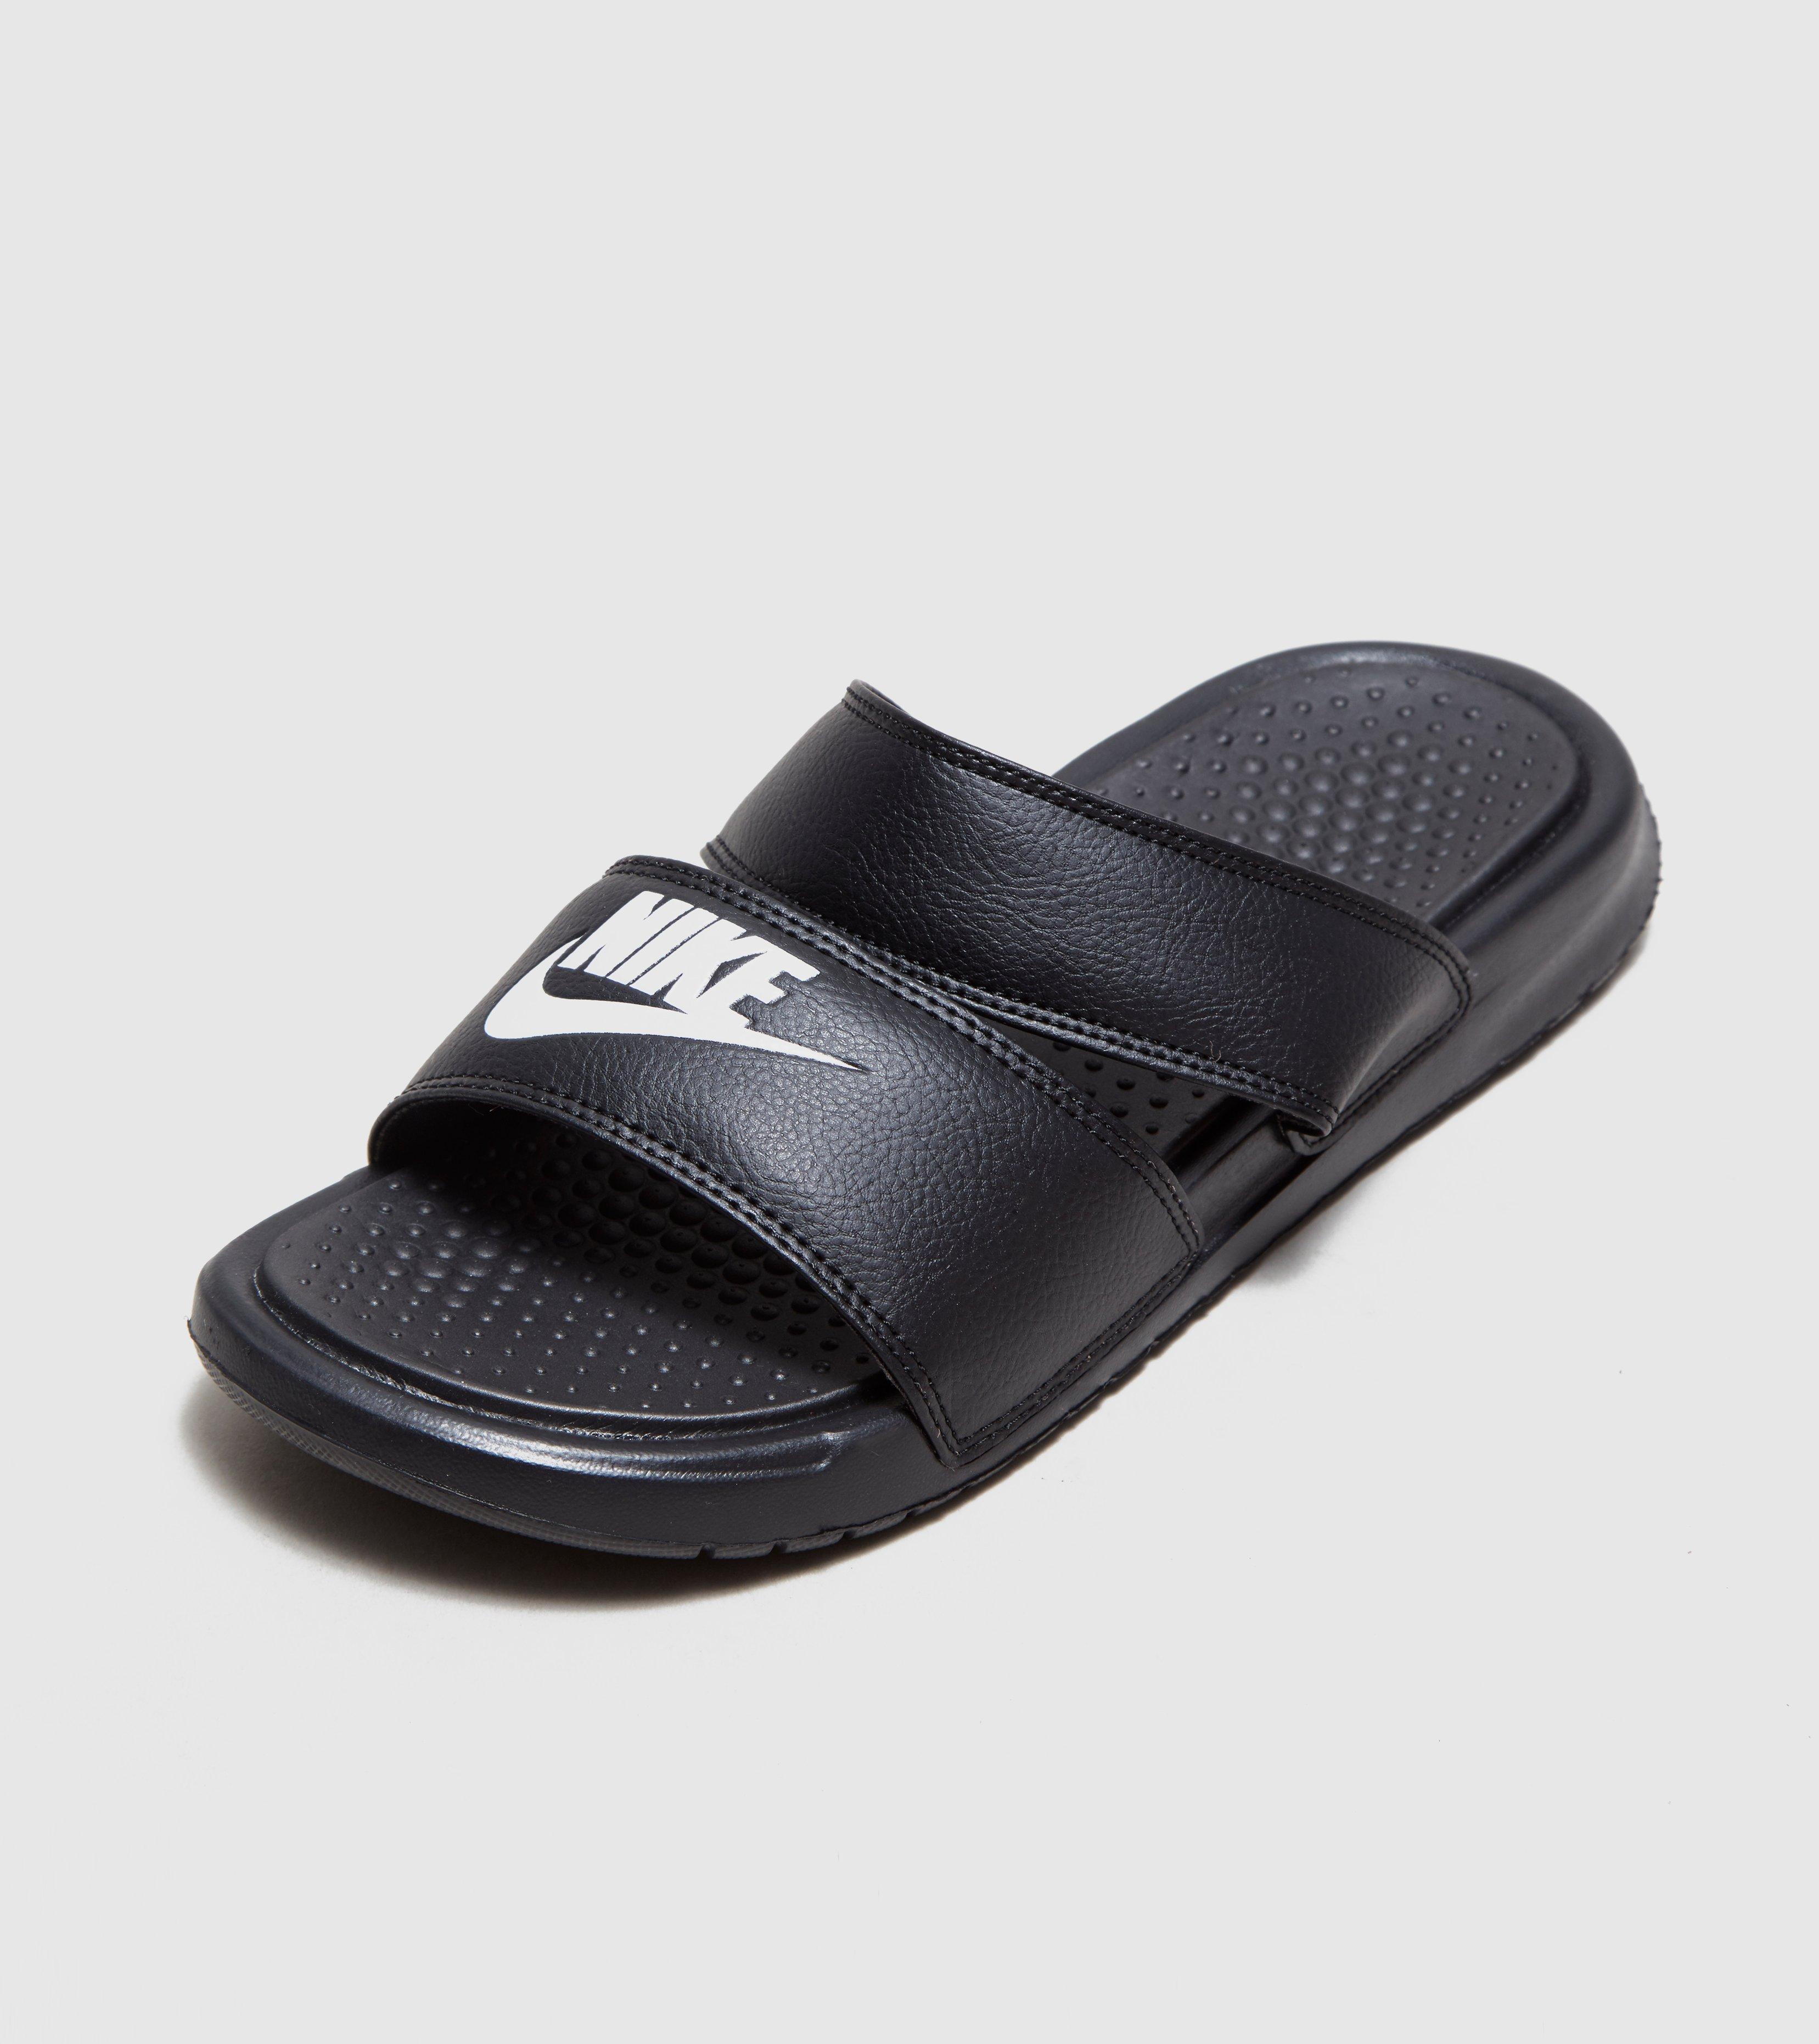 d071882ad Lyst - Nike Benassi Duo Ultra Slides Women s in Black